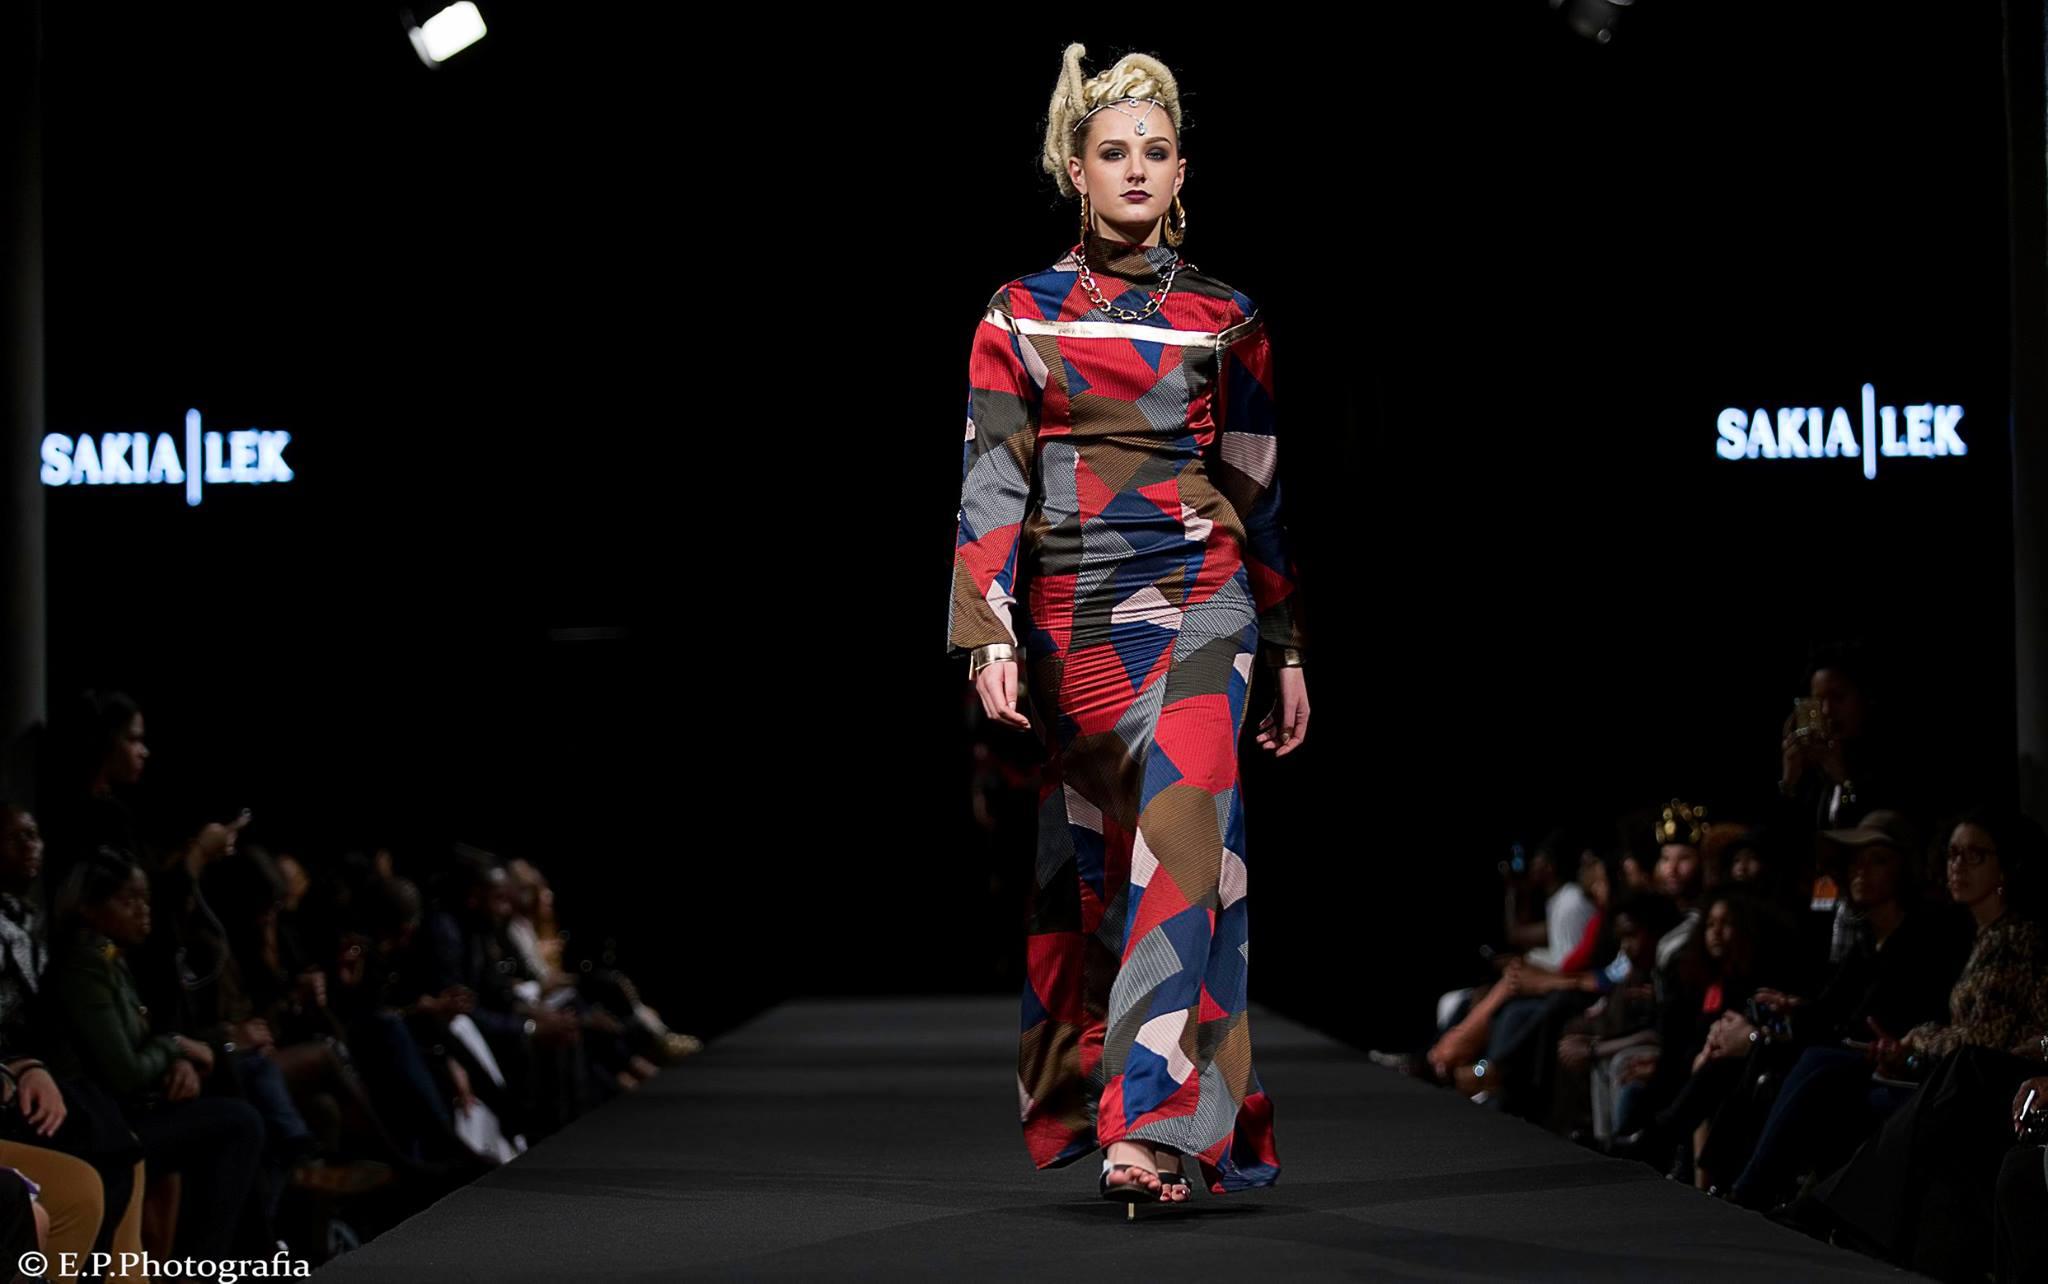 sakia lek black fashion week paris